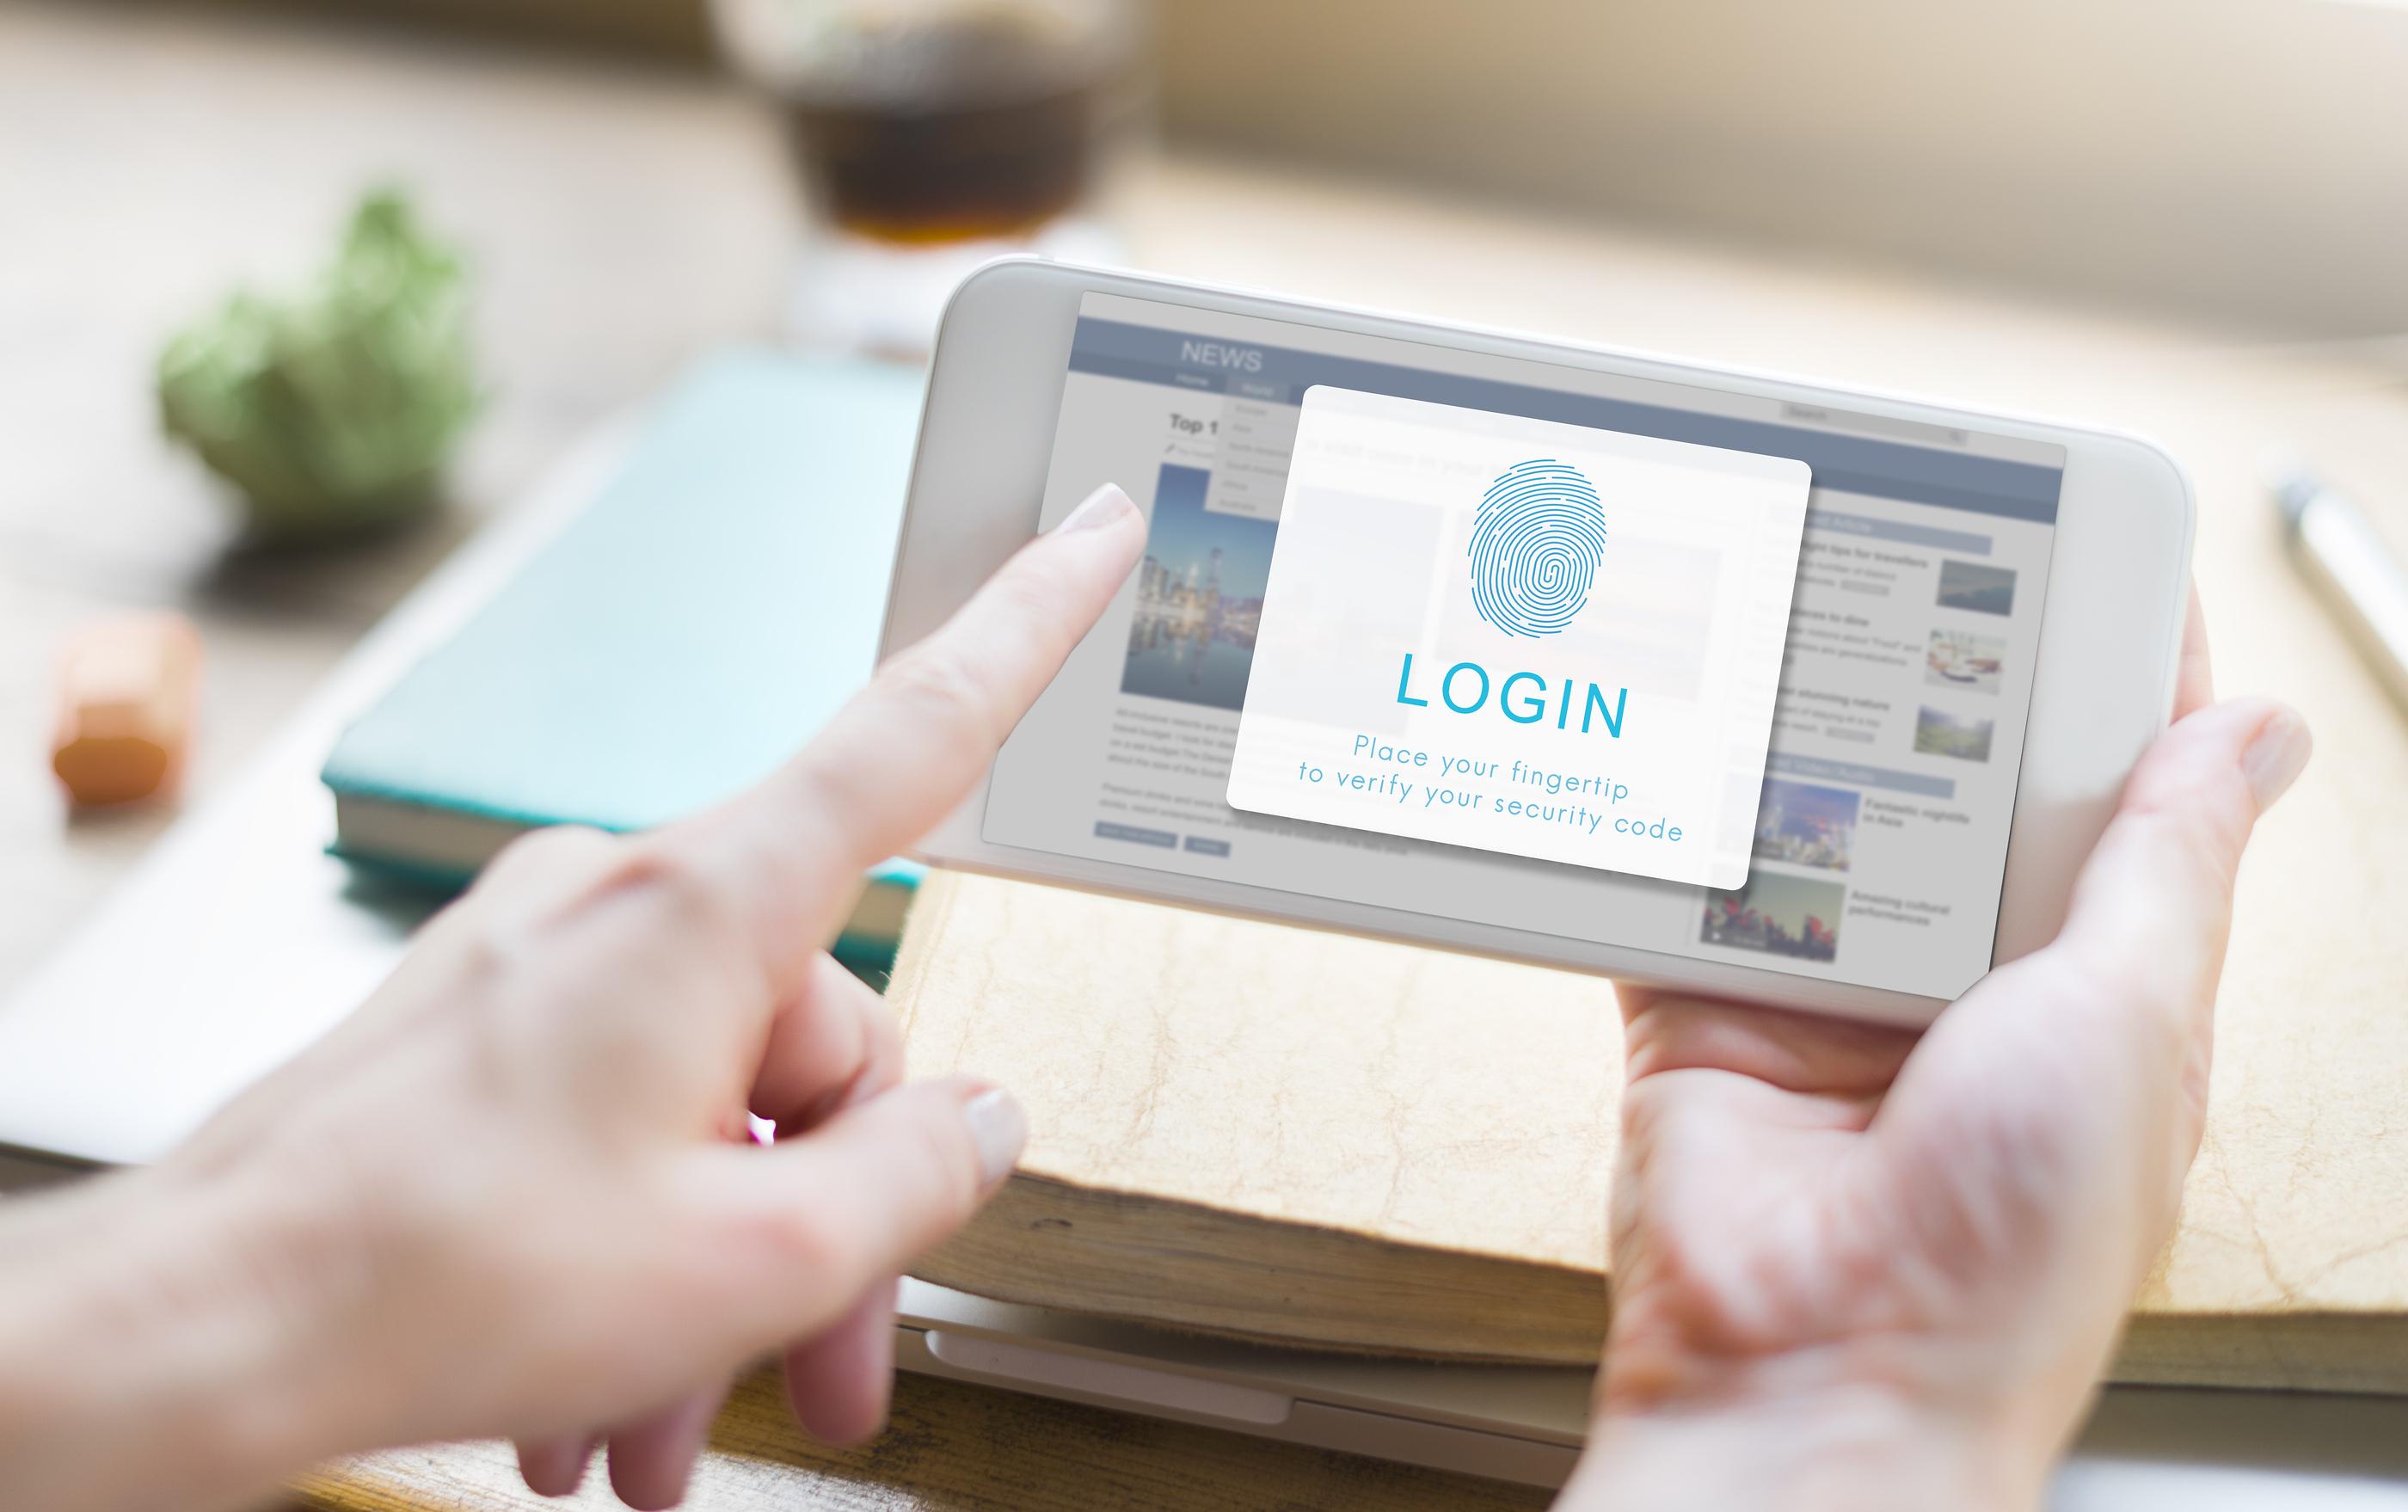 bigstock-Fingerprint-Password-Biometric-146933177